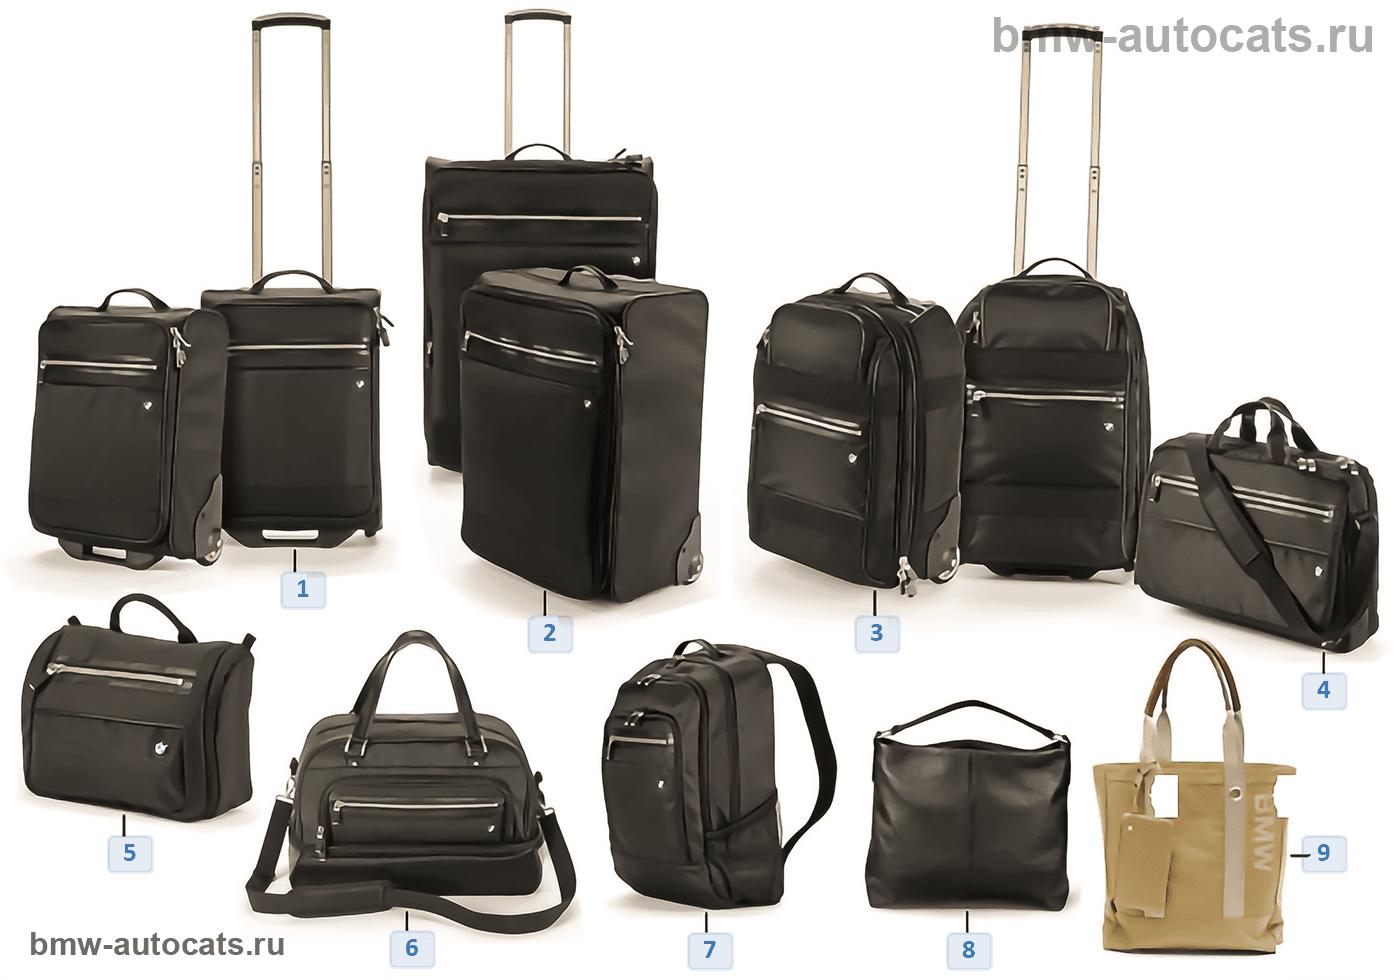 BMW Collection — сумки/чемоданы 2012/13